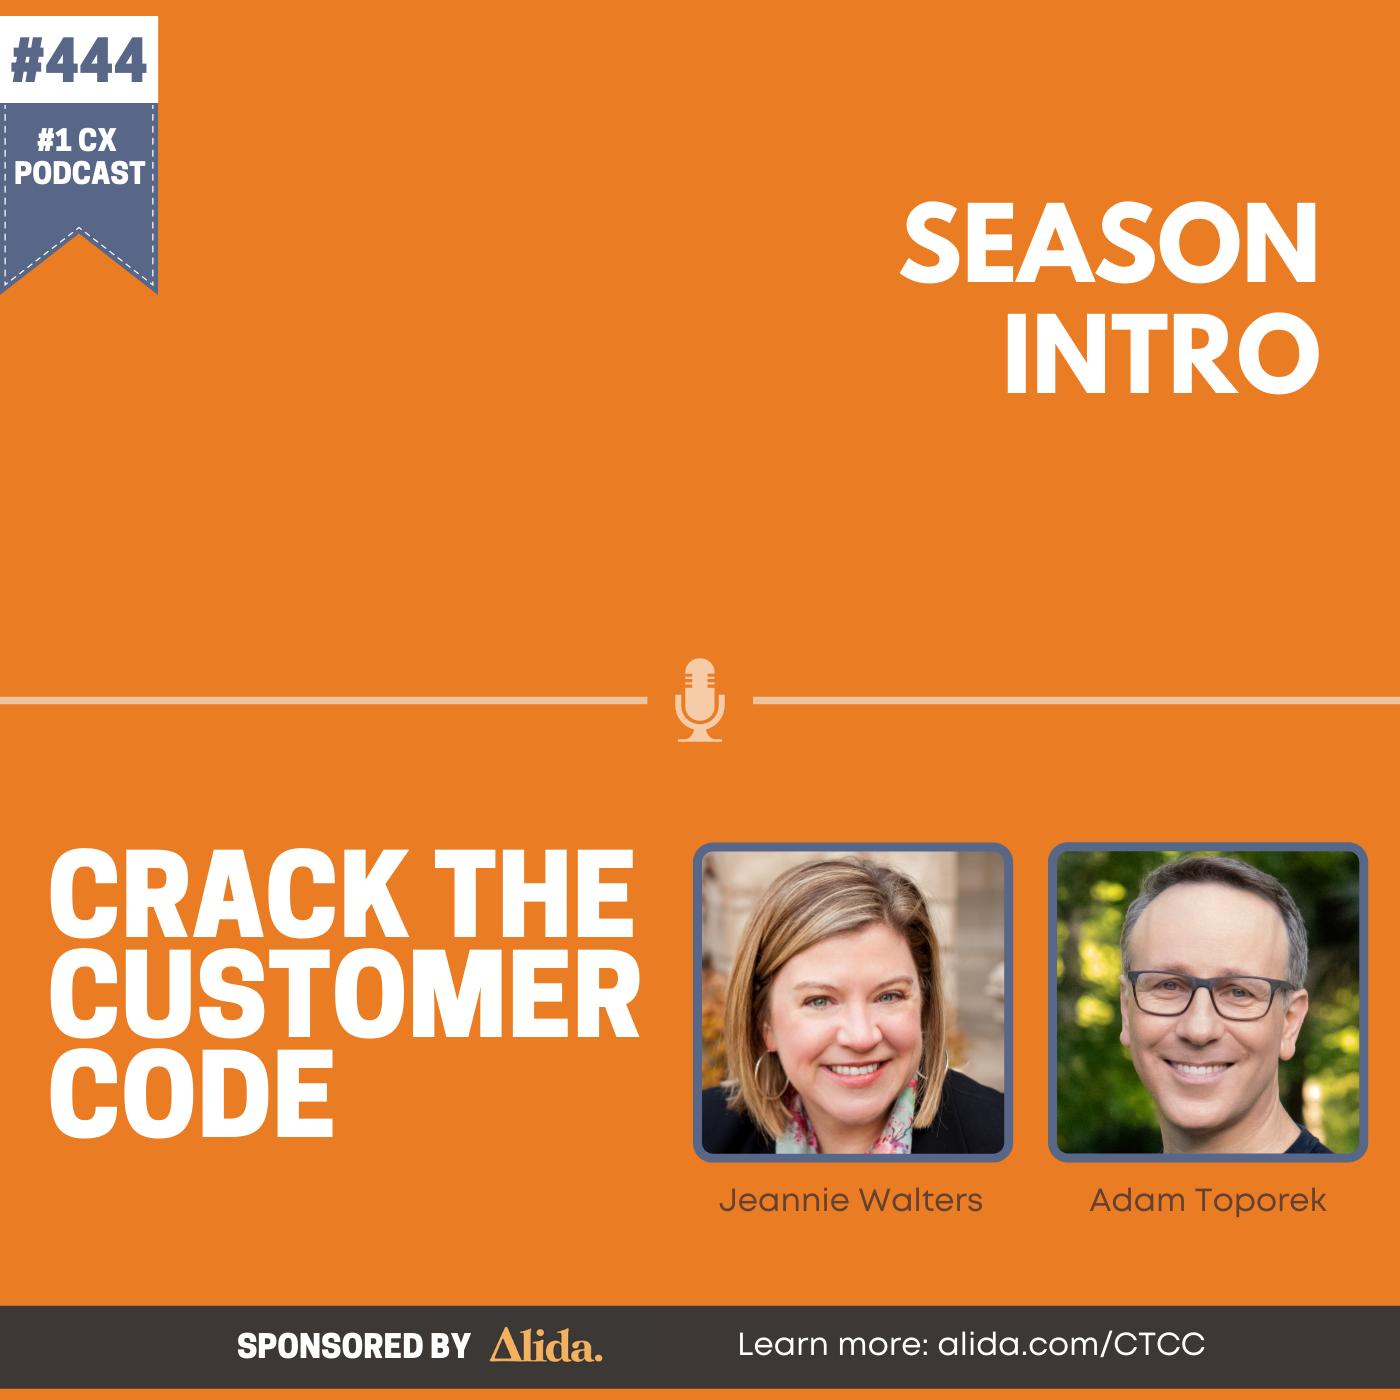 444: Season Intro